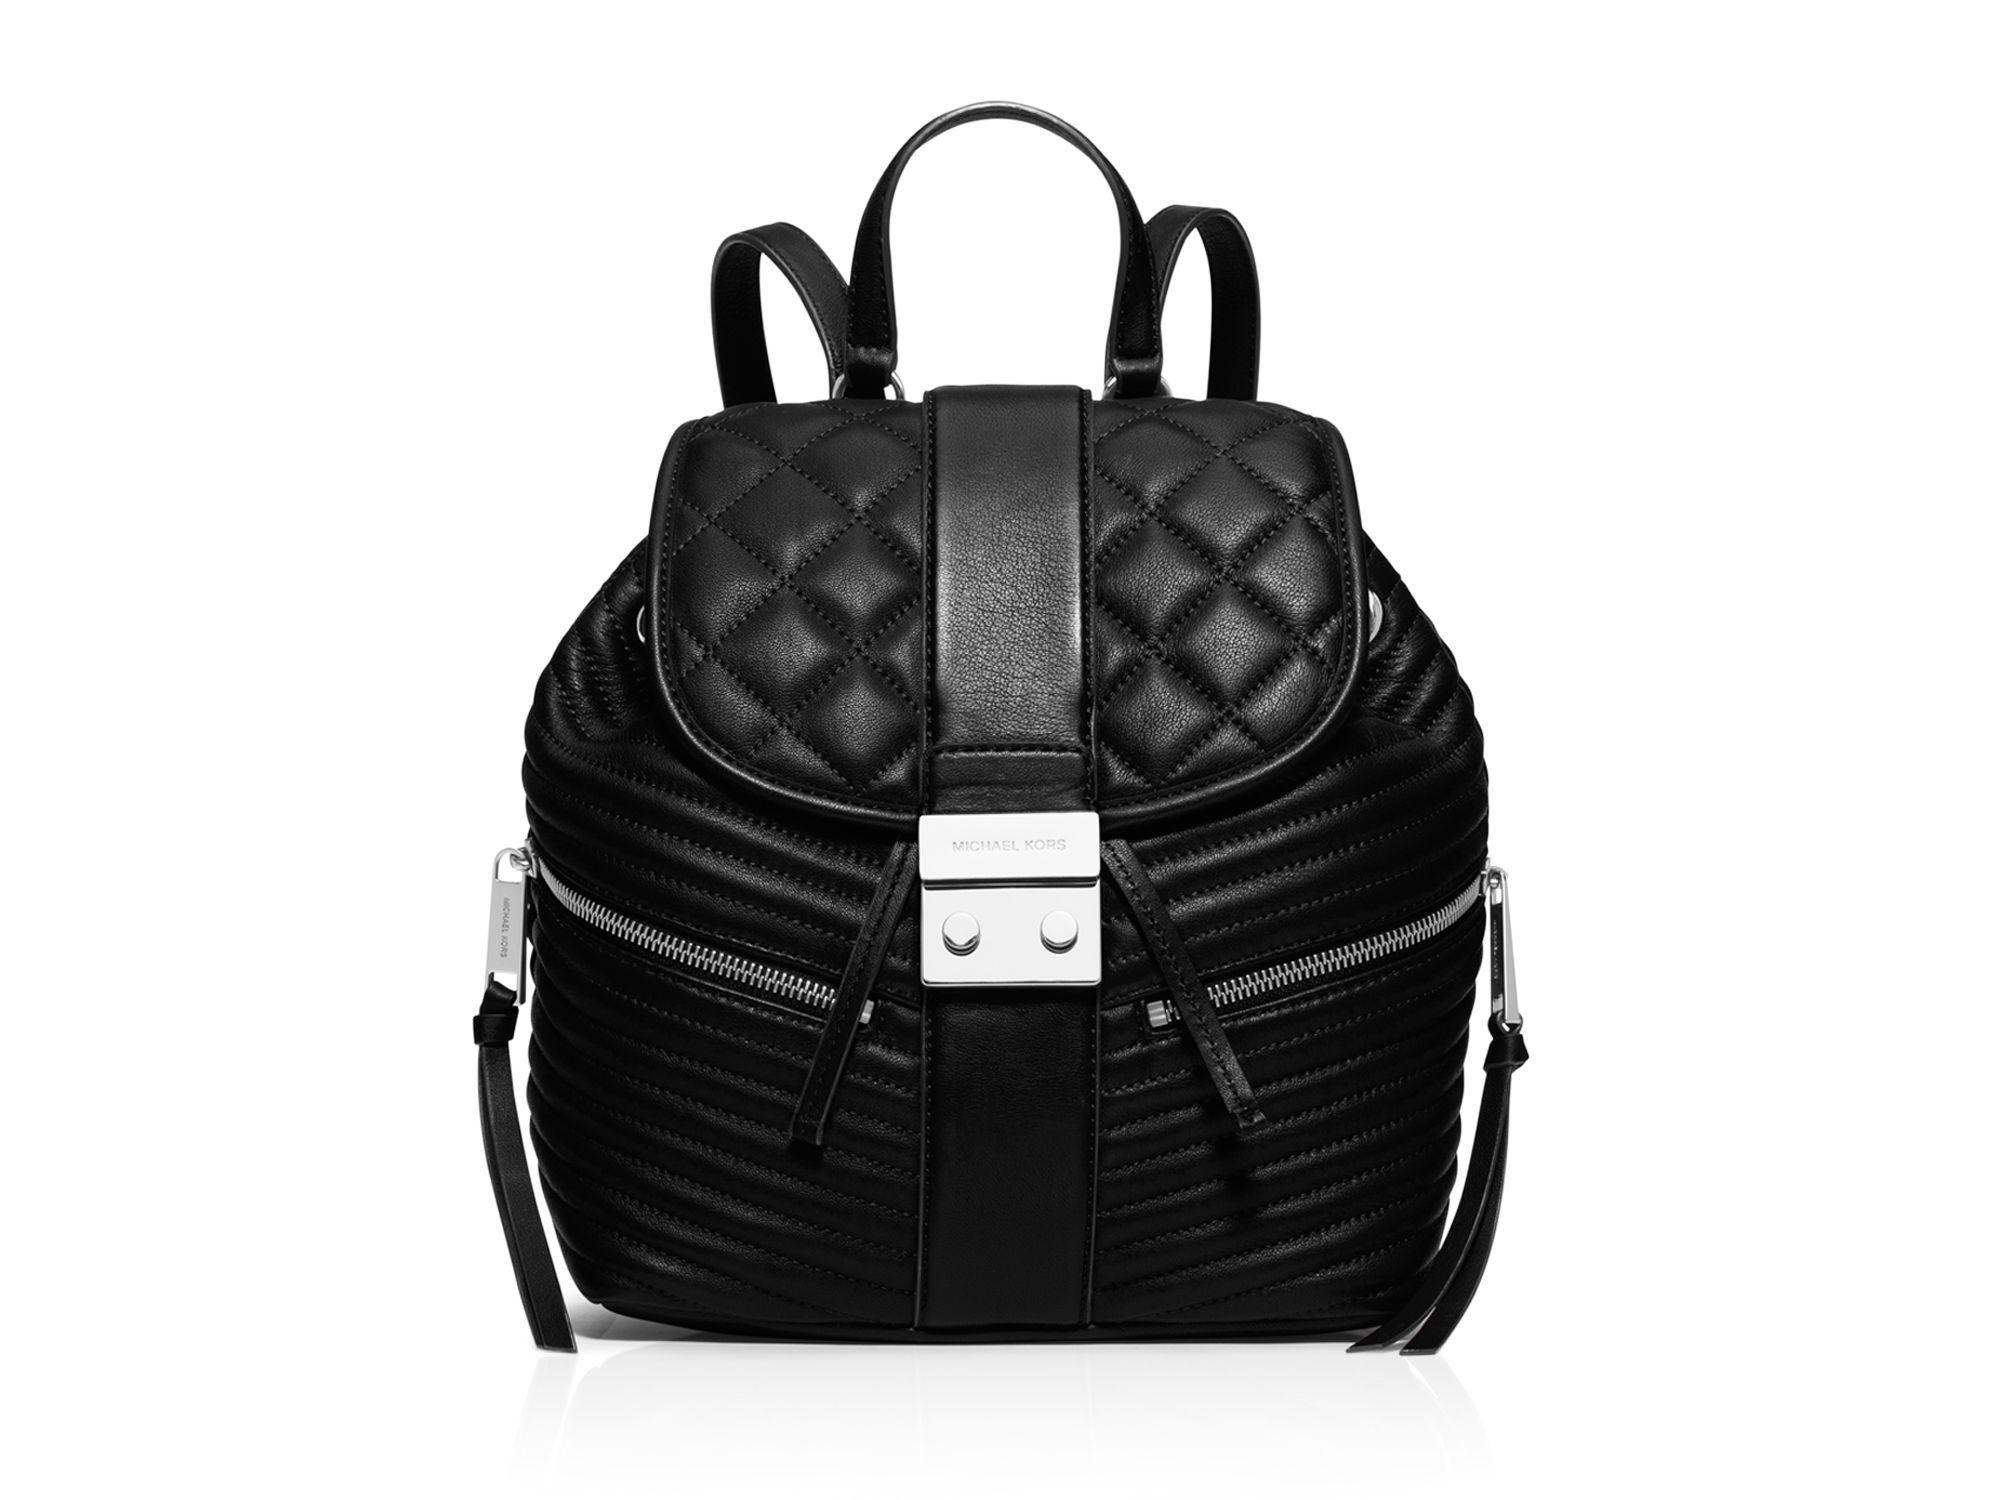 Michael michael kors Small Elisa Backpack in Black | Lyst